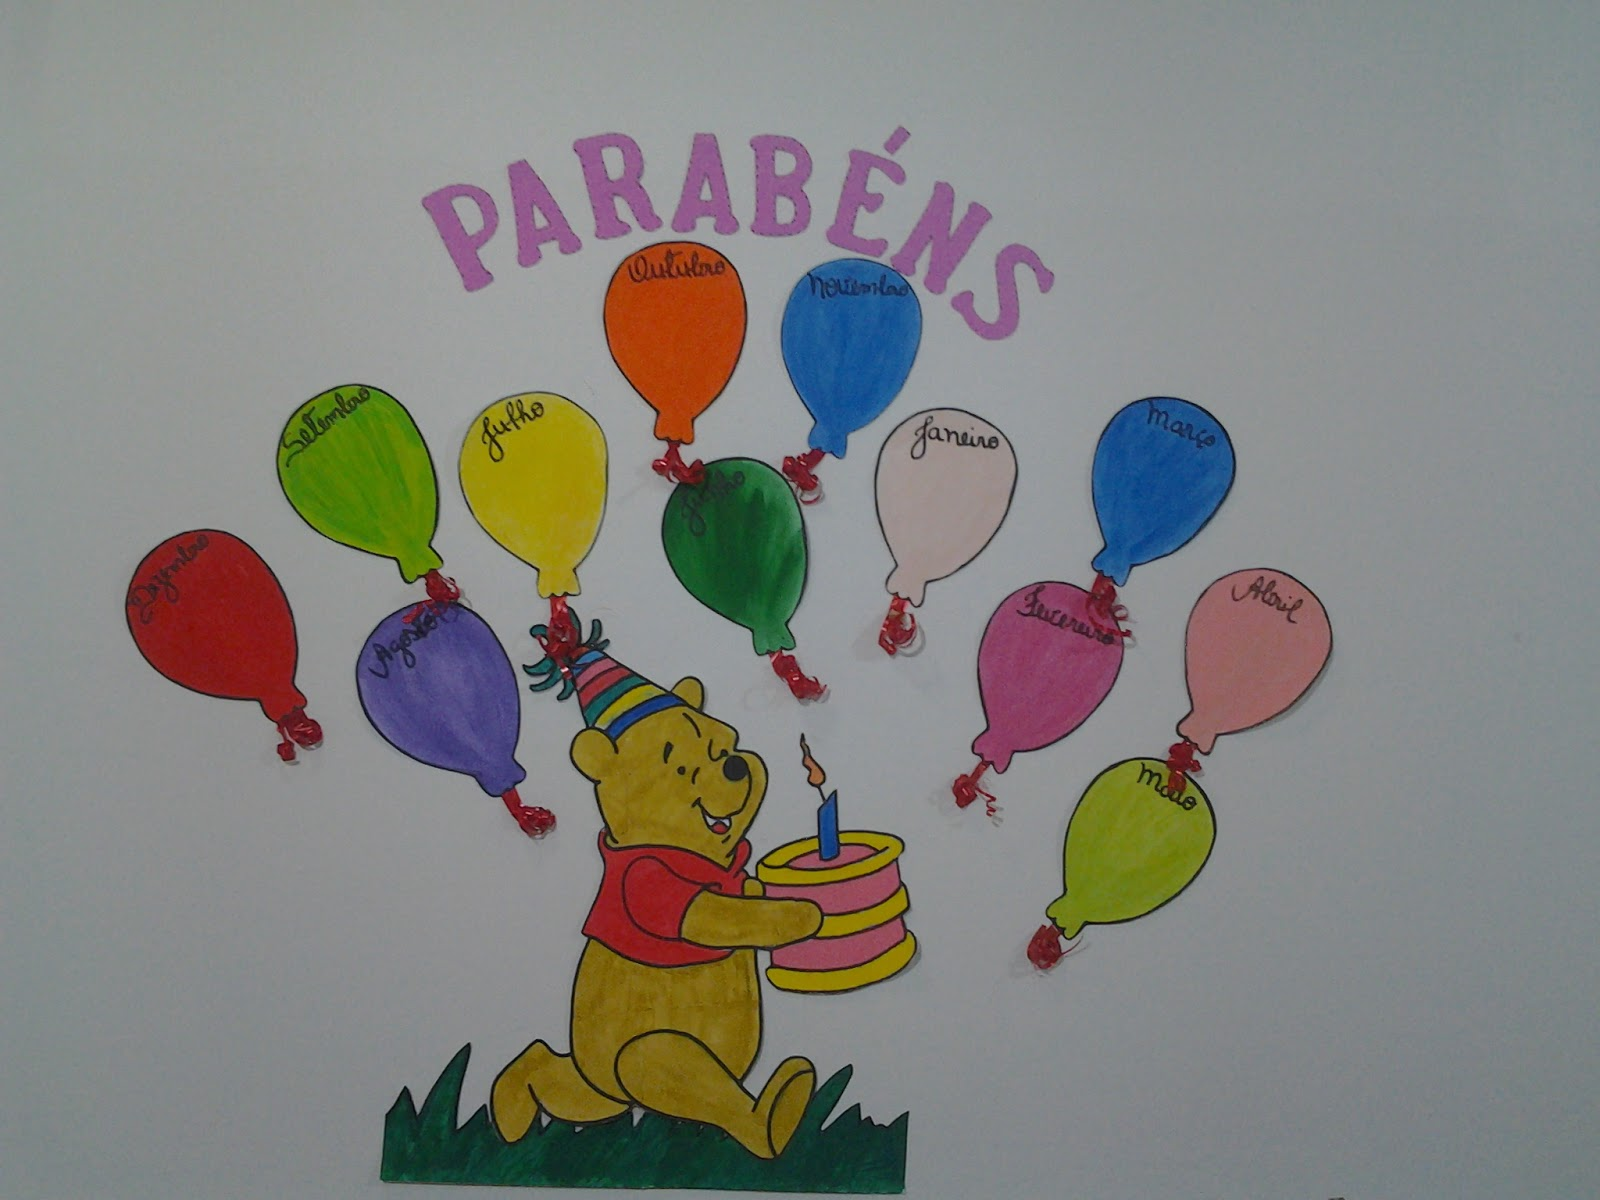 Decoracao De Sala Infantil ~  , 15 de fevereiro de 2013 # decoracao de sala aula educacao infantil